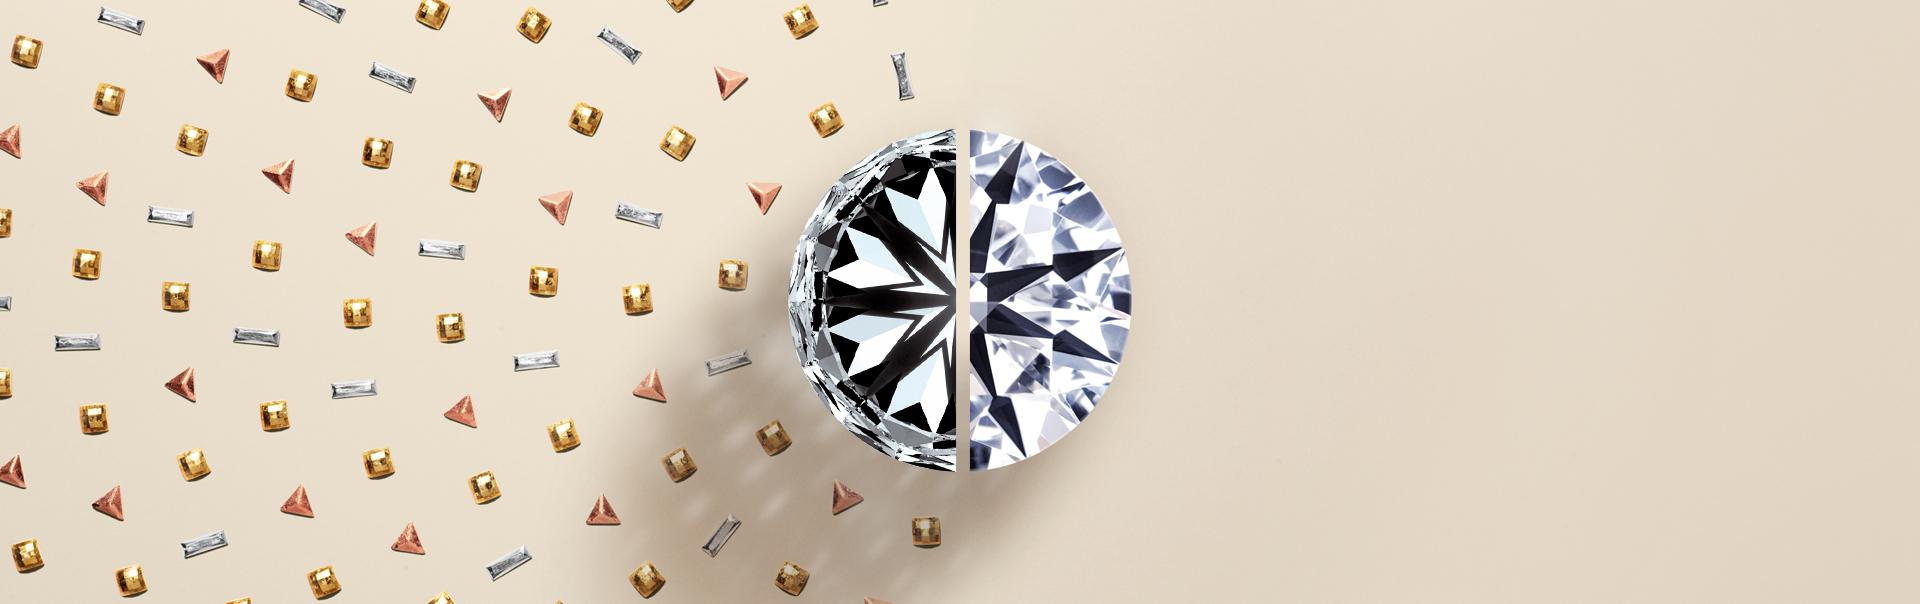 True Hearts perfectly symmetrical diamond